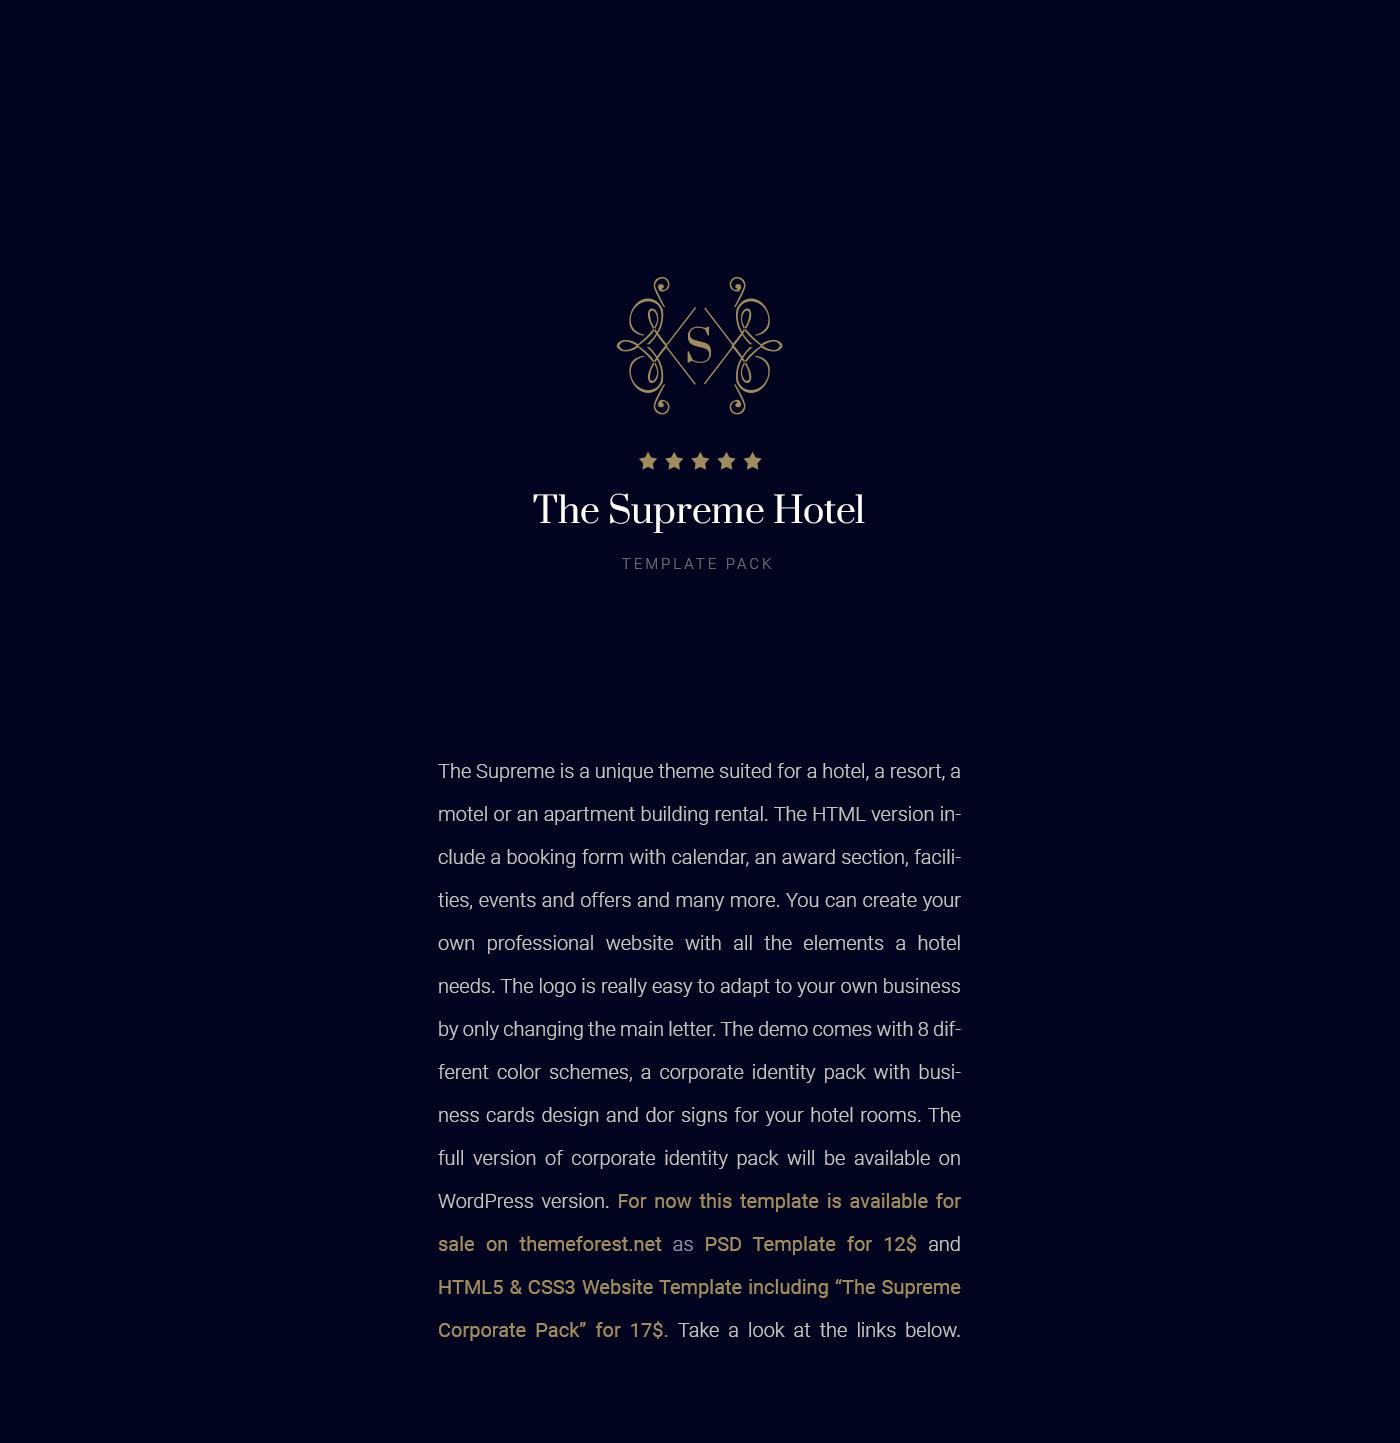 hotel hotel website Hotel Logo Hotel Branding Luxury Hotel hostel motel resort hotel corporate identity free psd template Spa